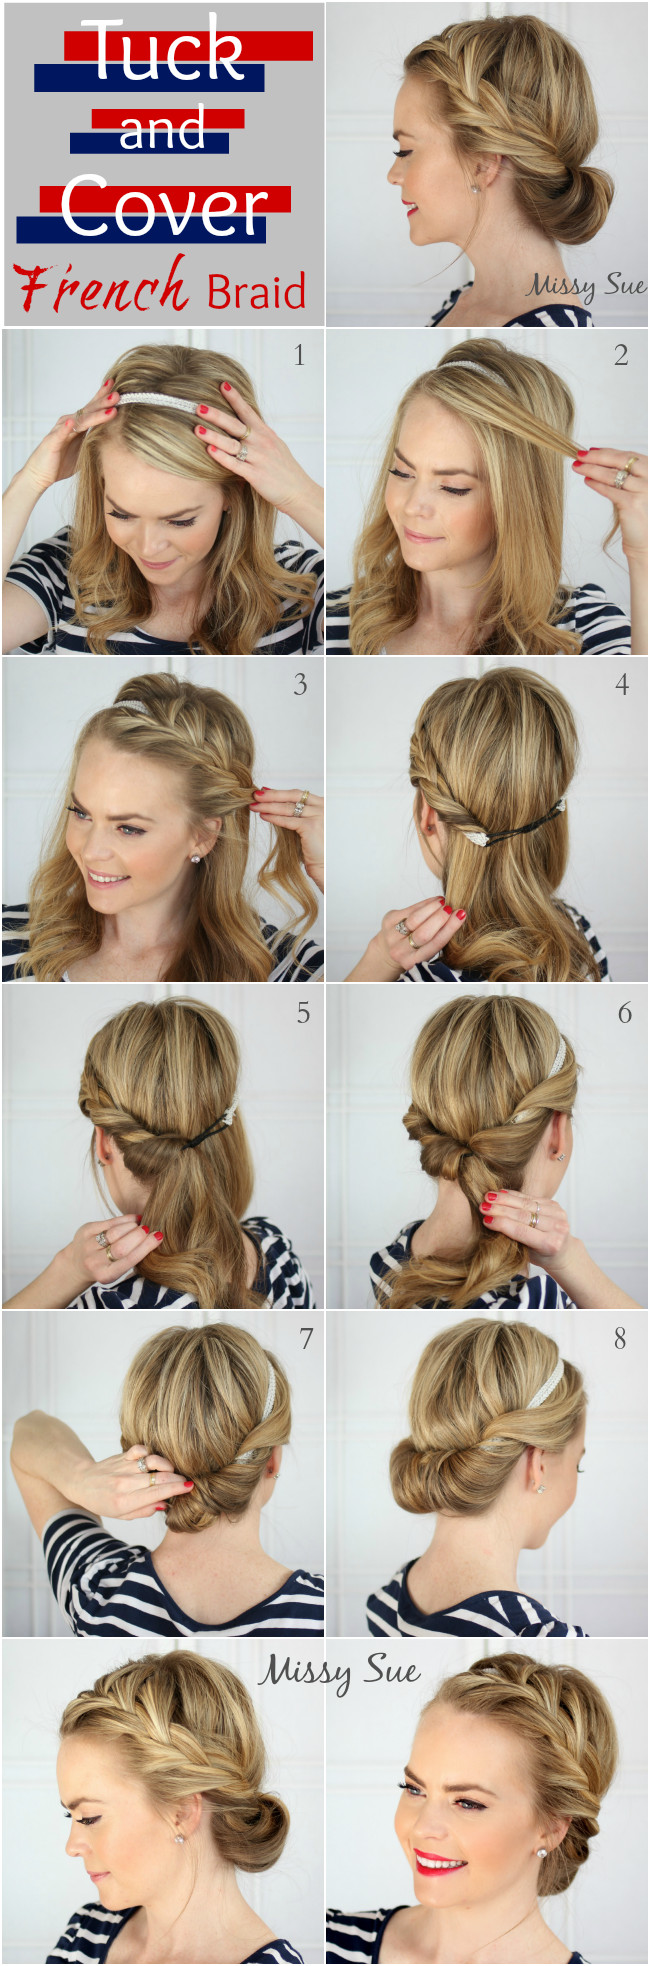 Best ideas about DIY Wedding Hairstyles For Long Hair . Save or Pin 10 Best DIY Wedding Hairstyles with Tutorials Now.